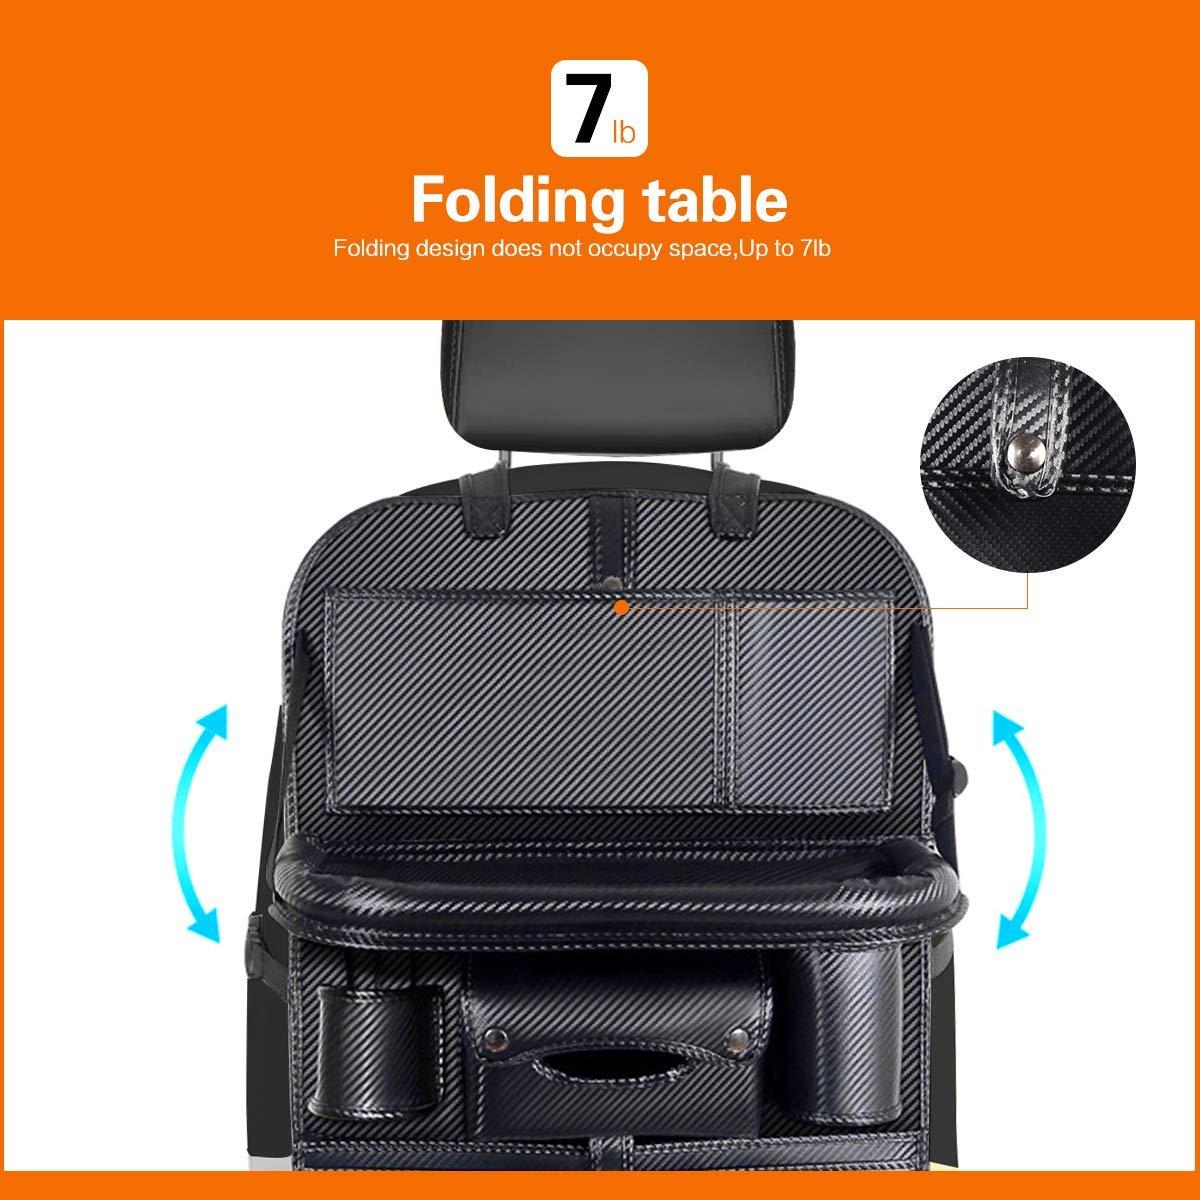 Tissue Box Car Backseat Organizer with 4 USB Port iPad Phone Umbrella Bag Multifunctional Premium PU Leather Travel Car Storage Bags with Foldable Tray 3 Mesh Bags 1 Large Bag